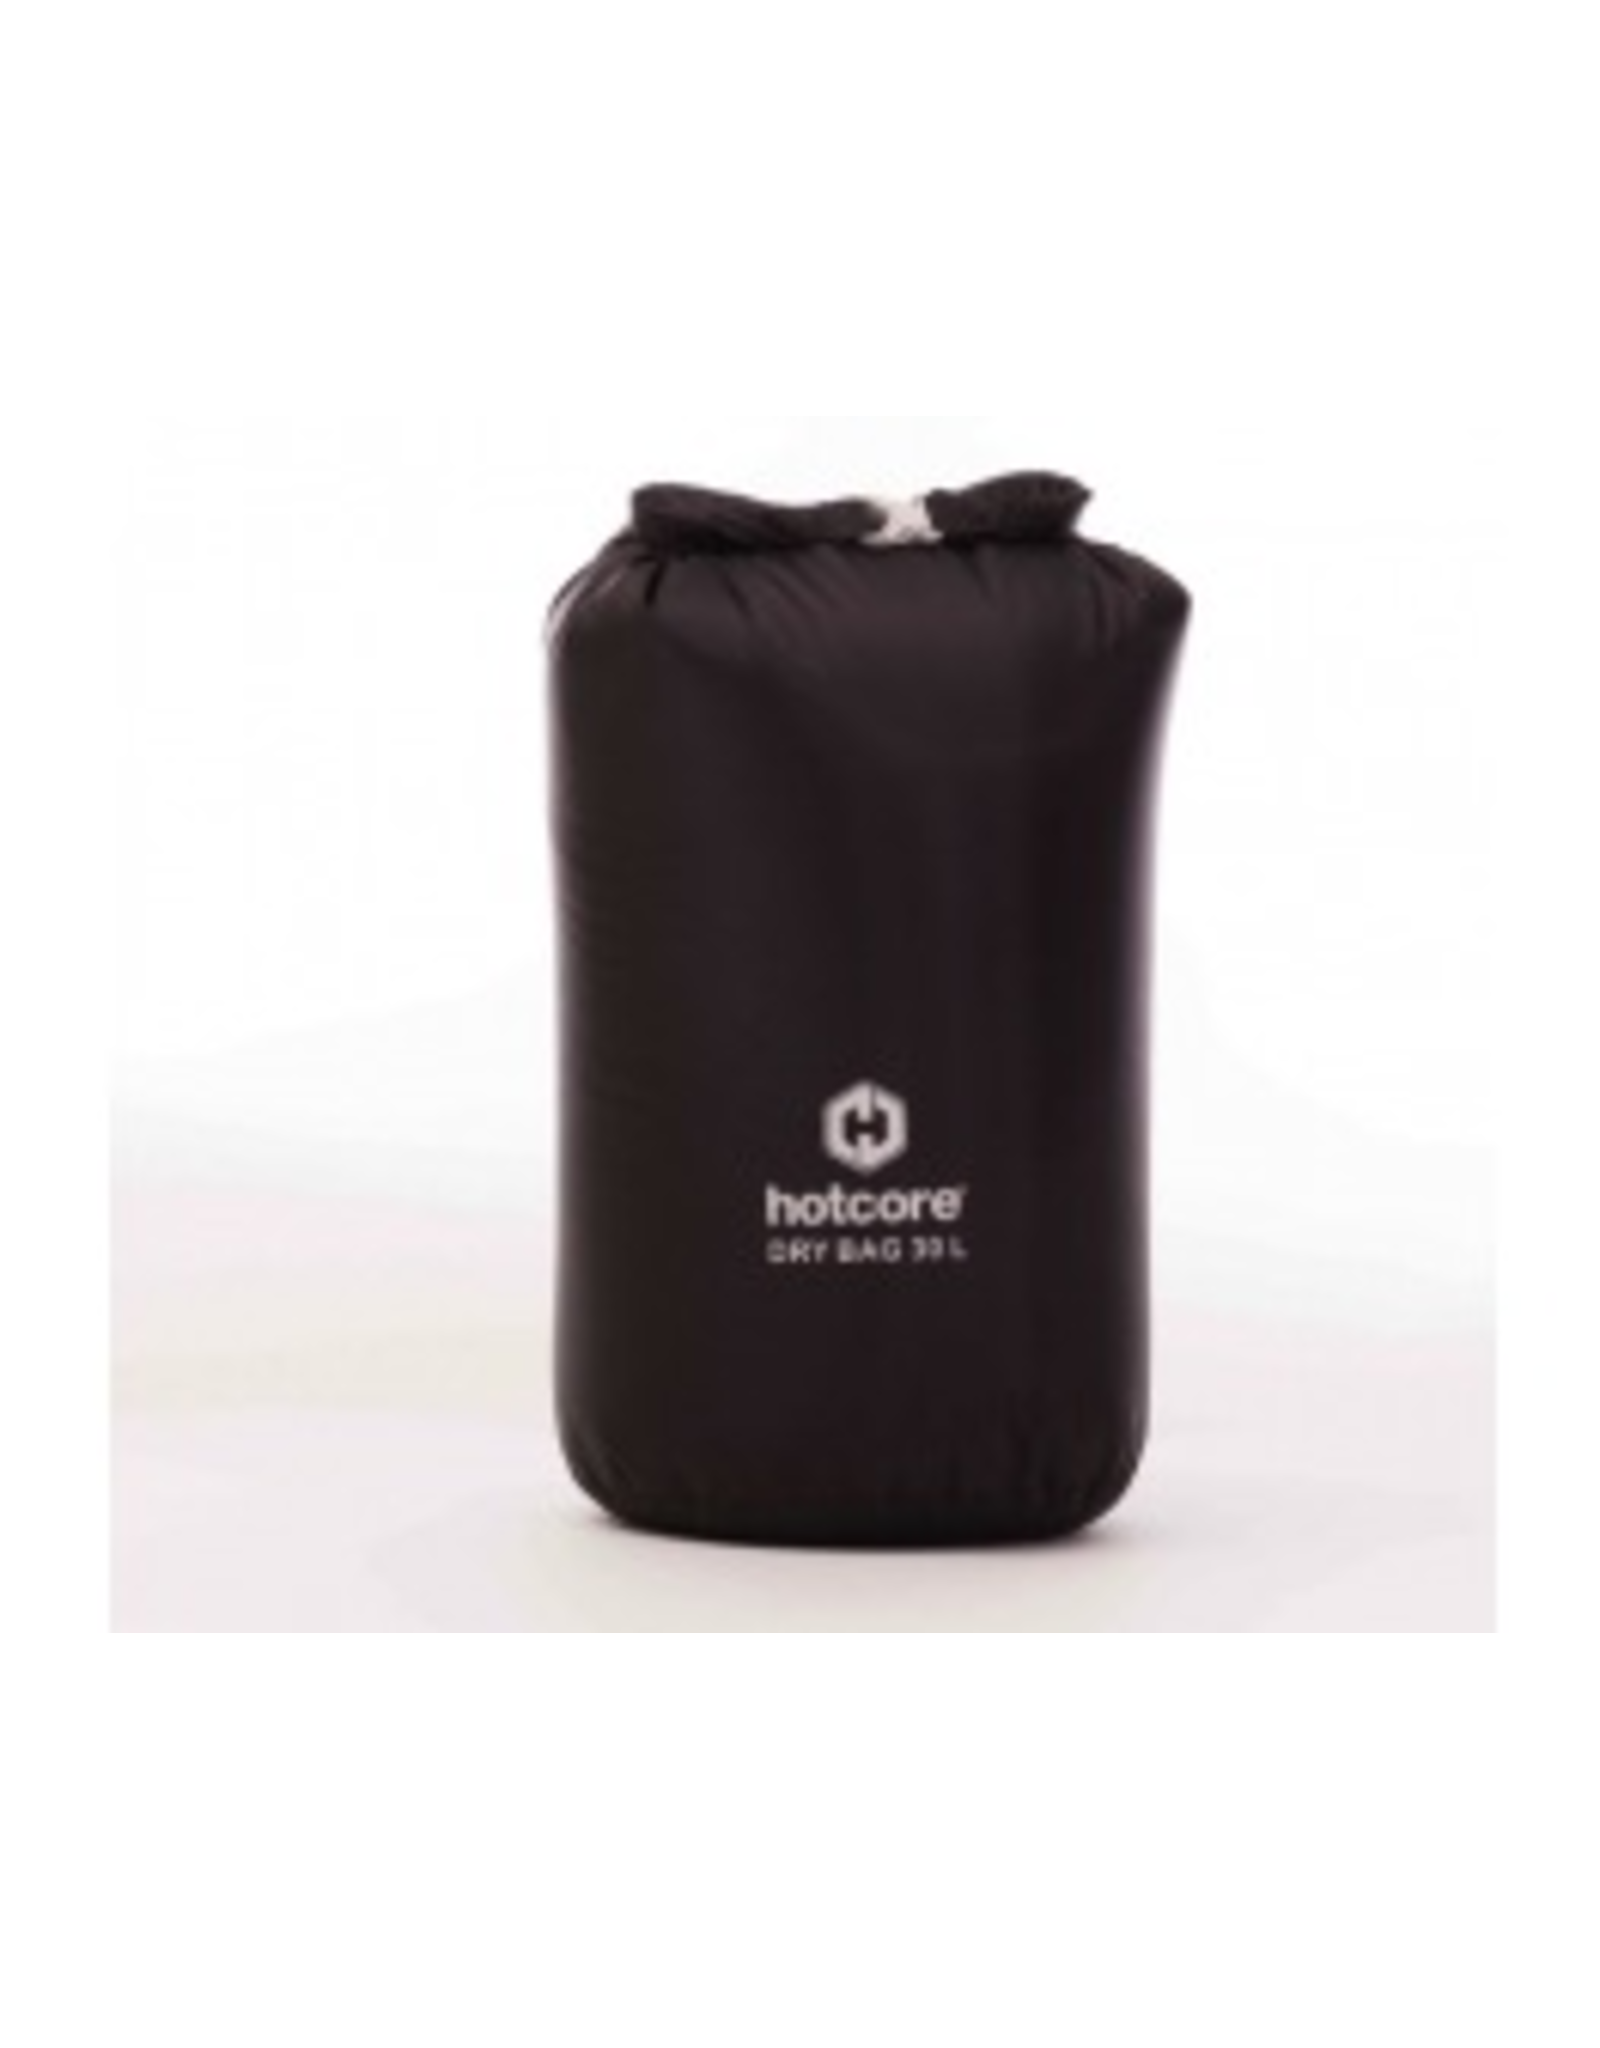 Hotcore Hotcore Lightweight Dry Bag